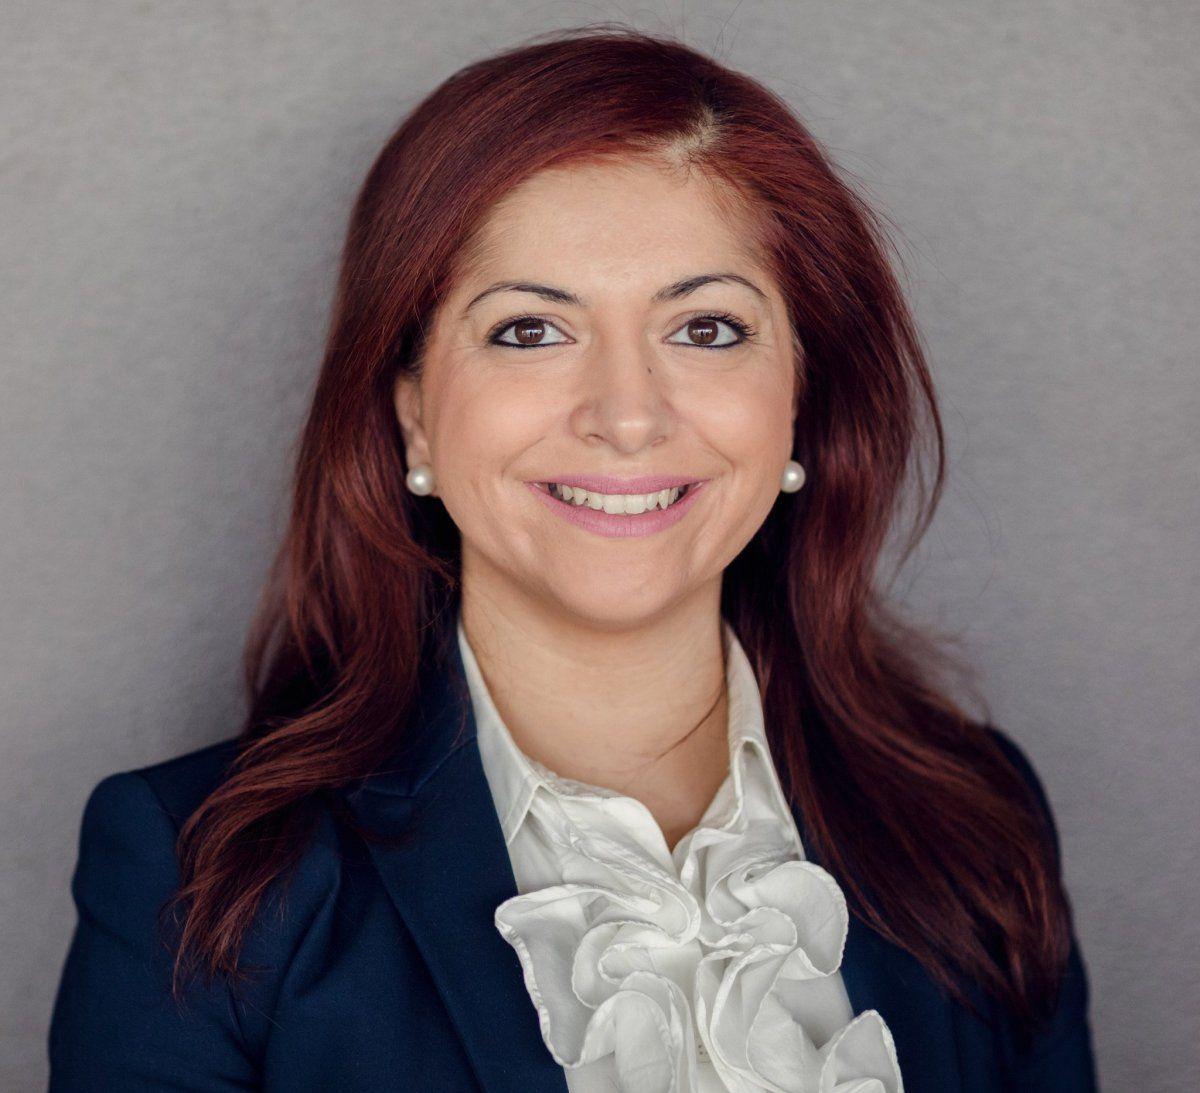 Monica Verma